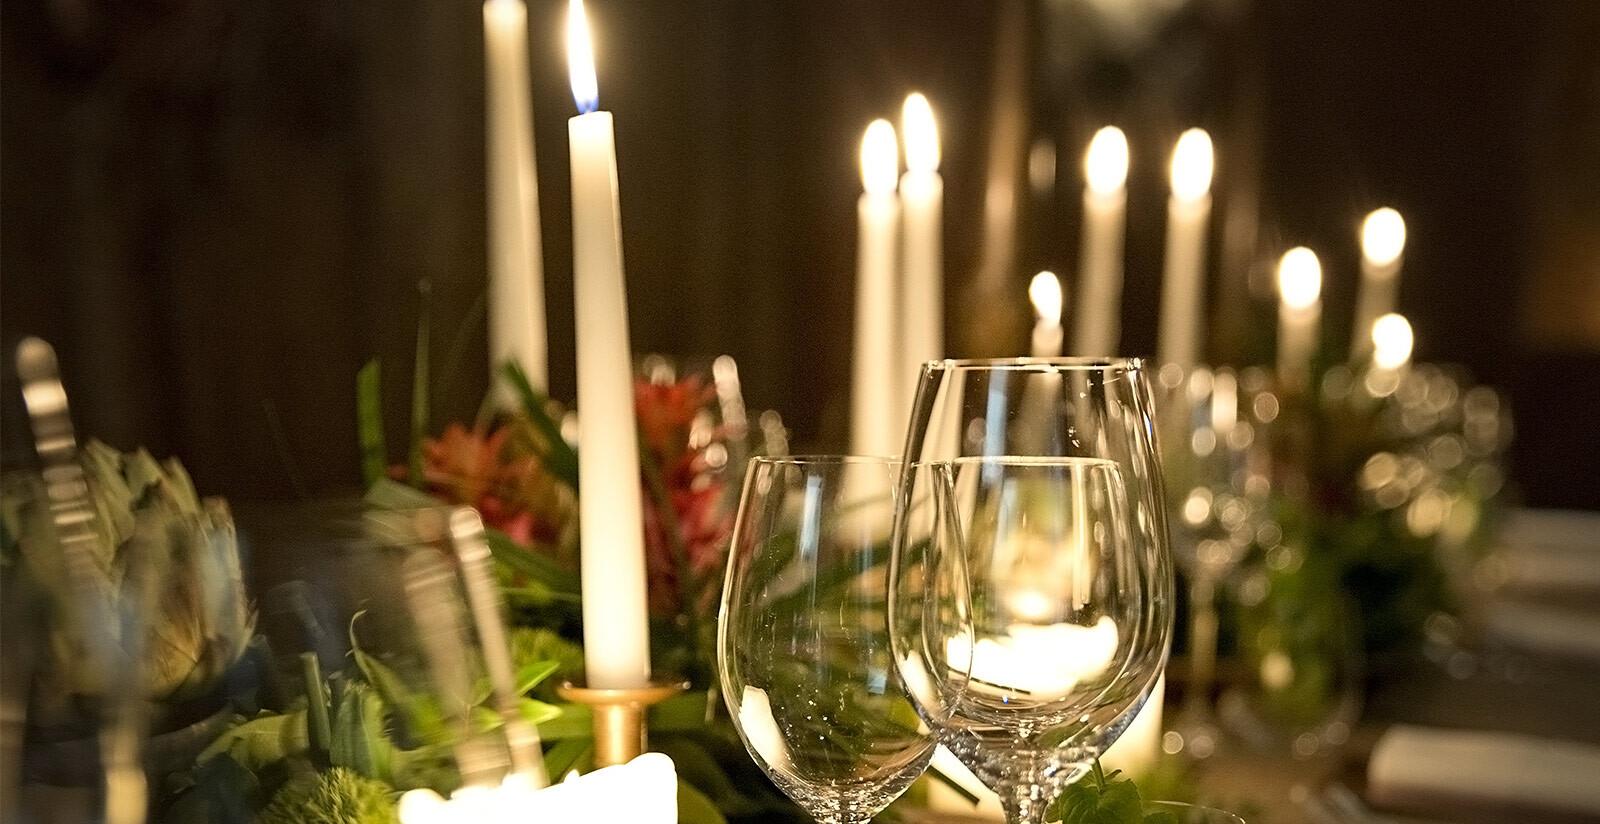 La cena al Metropole di Venezia.